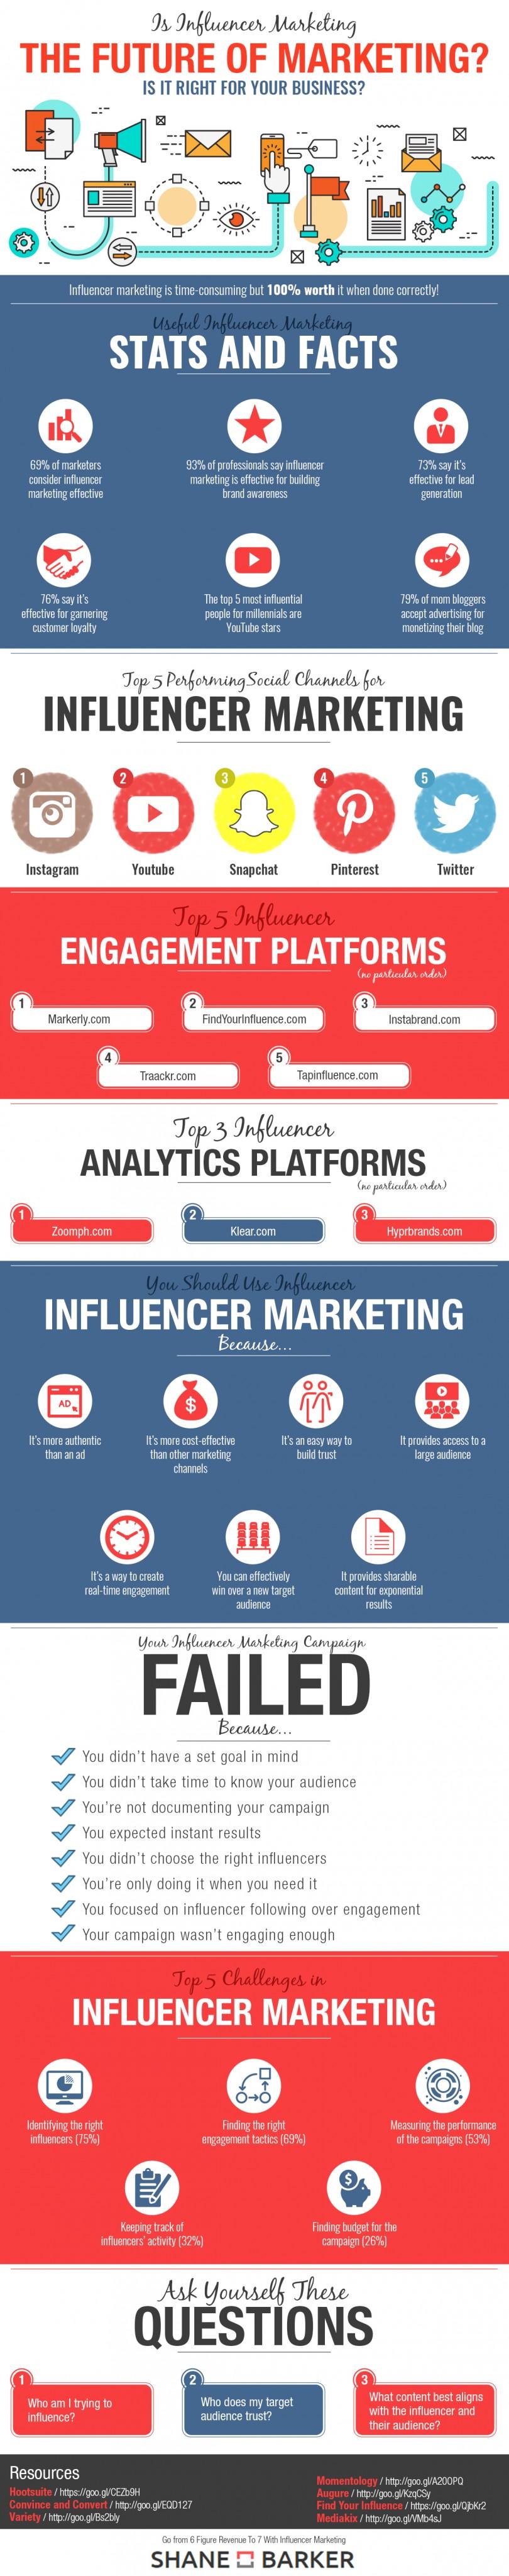 infographie-307-influencer-marketing